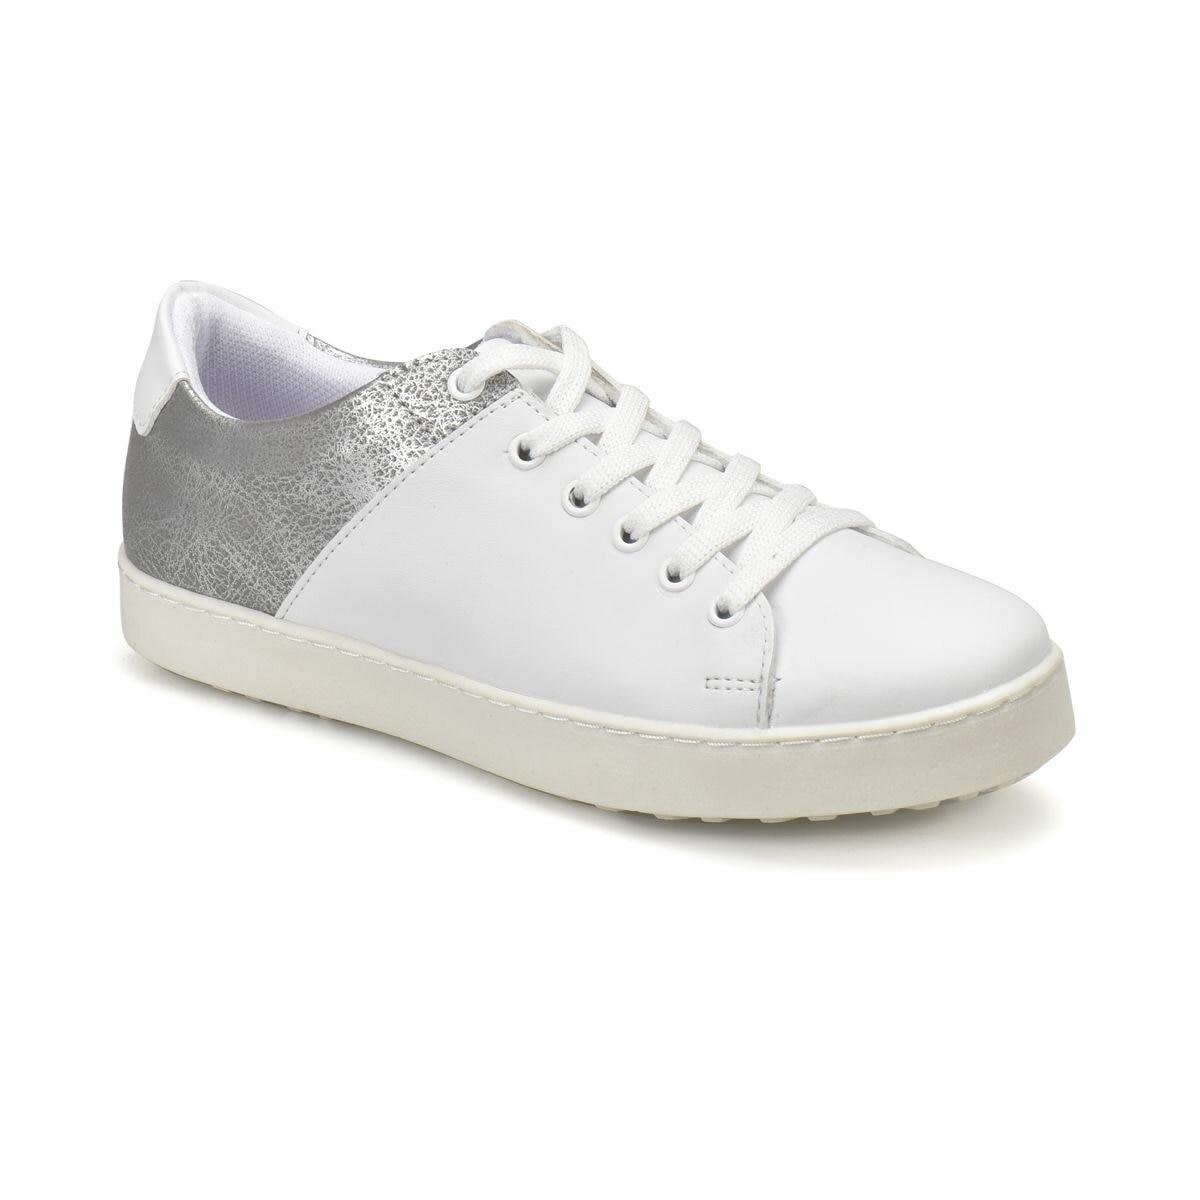 FLO CS18044 White Women 'S Sneaker Shoes Art Bella